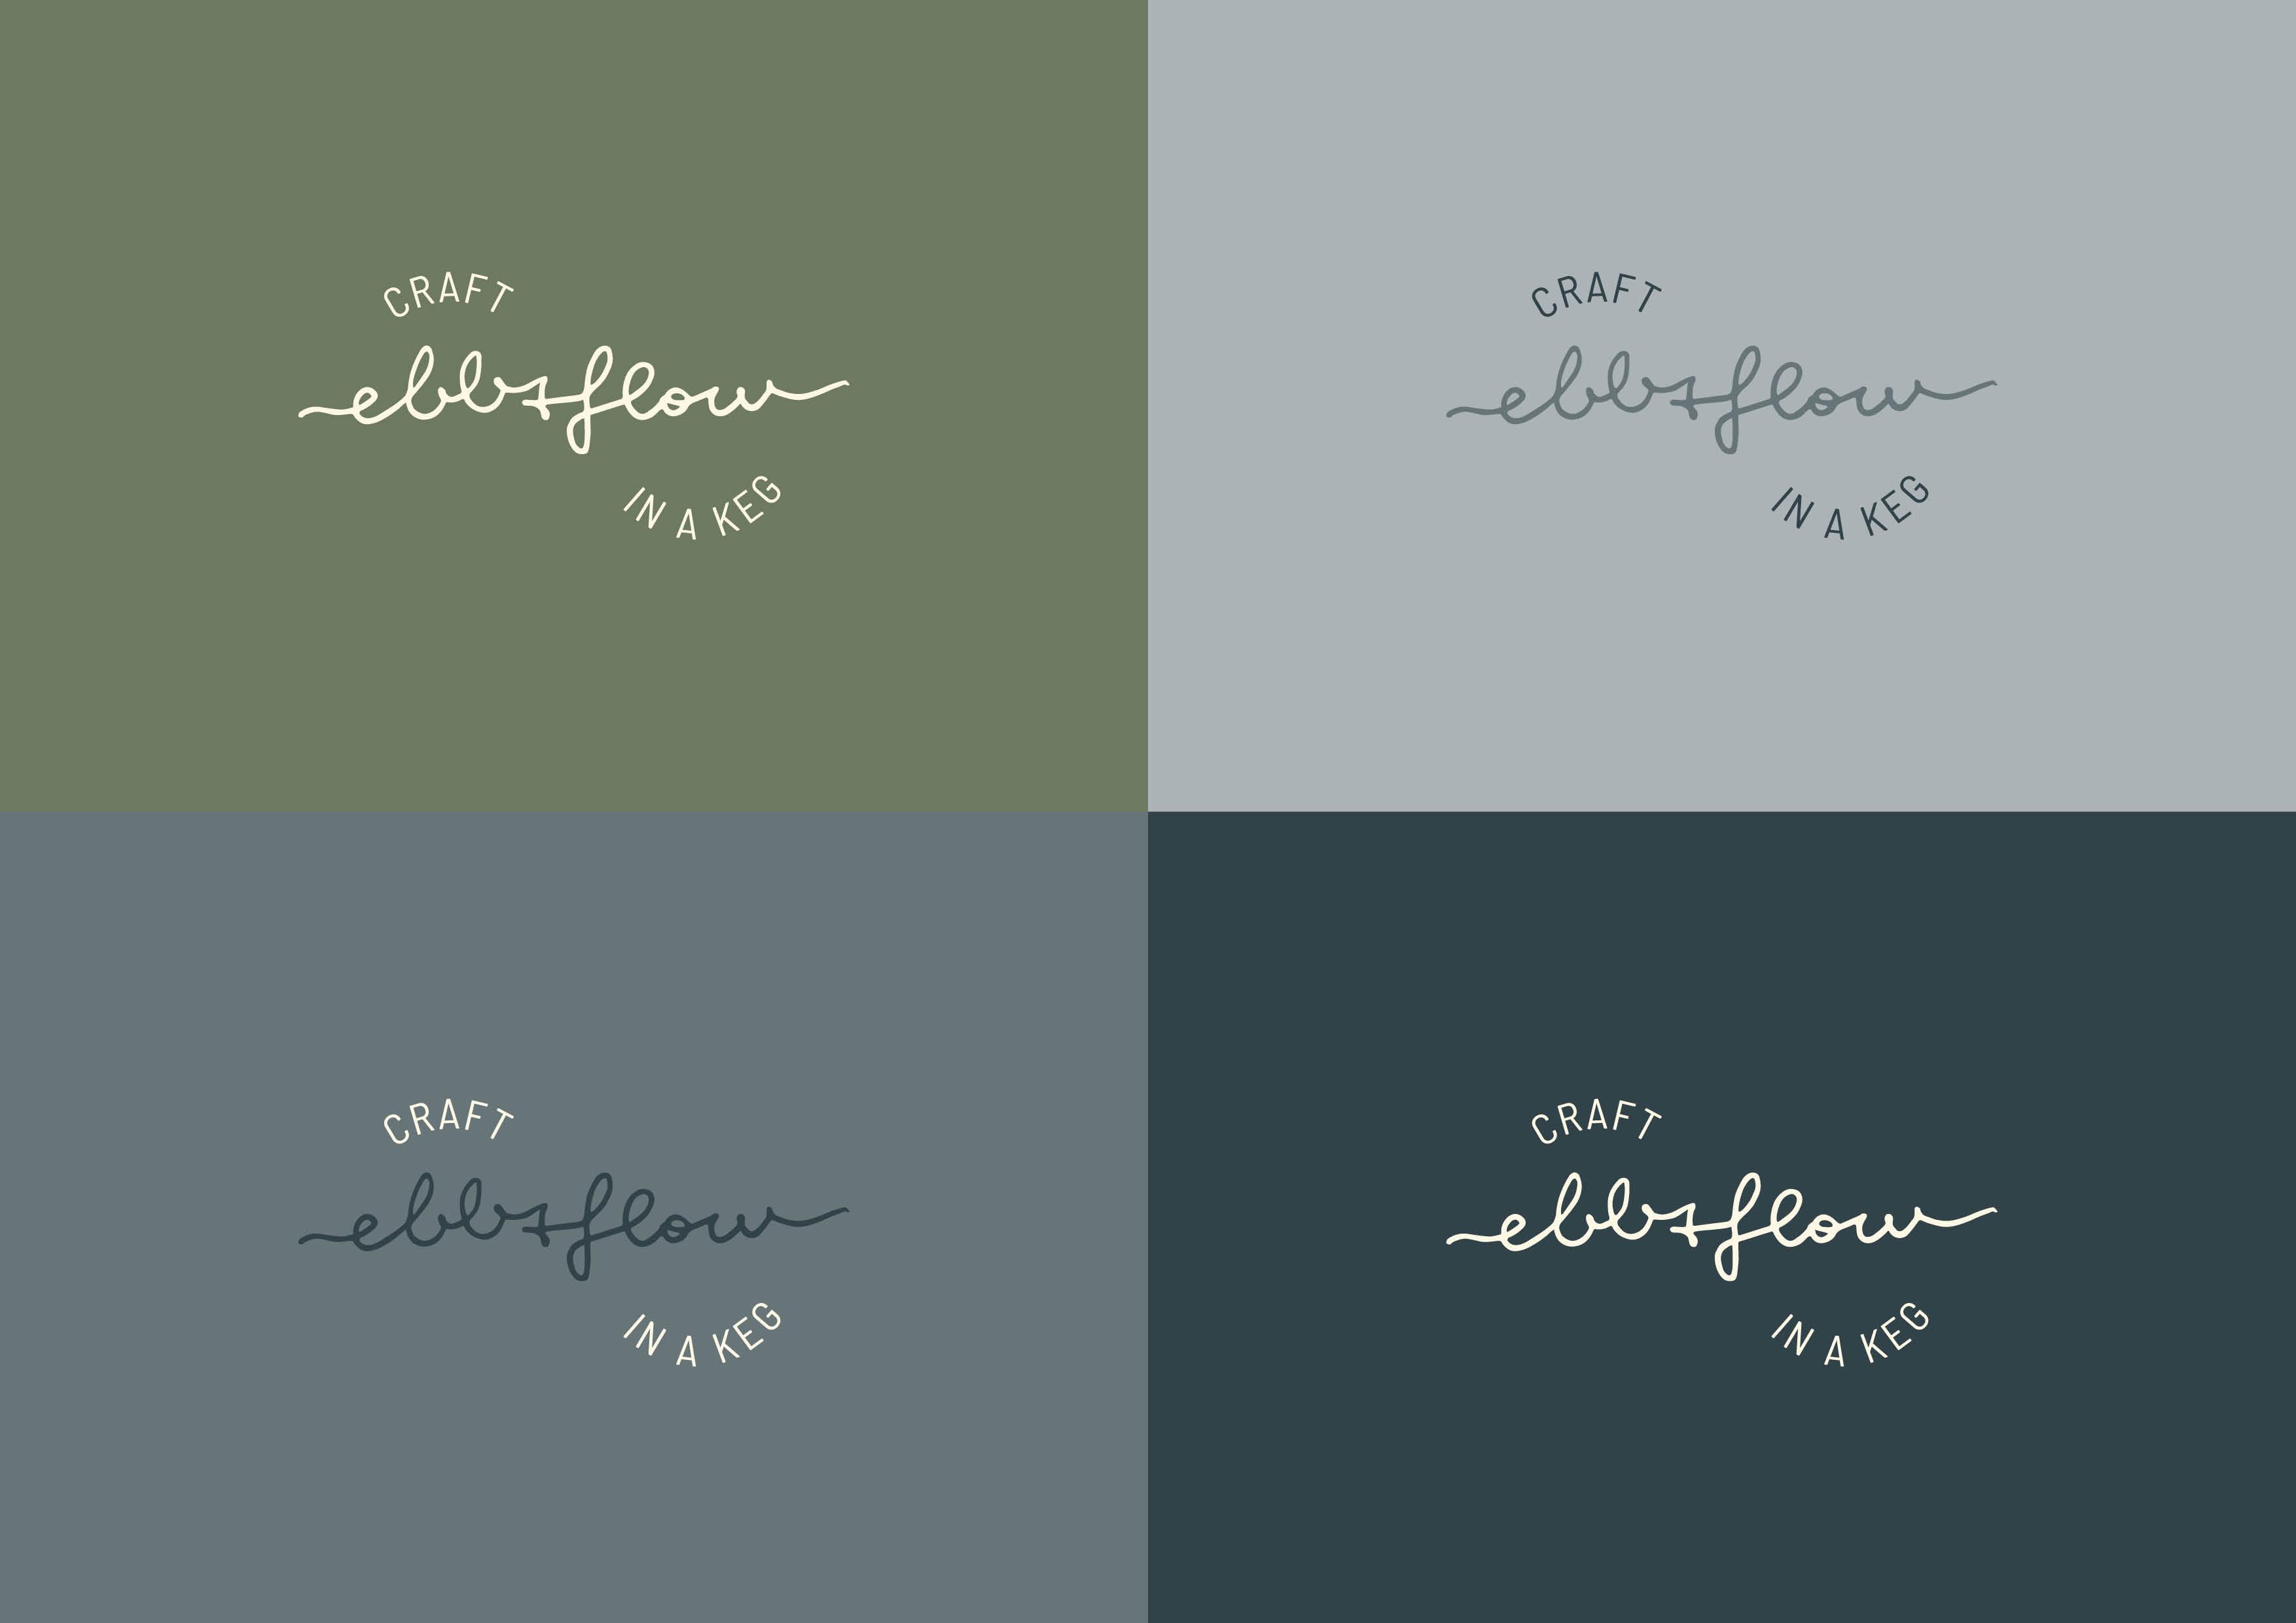 Ebb&Flow Keg - Brand Identity (Logo) by Magdalena Weiss